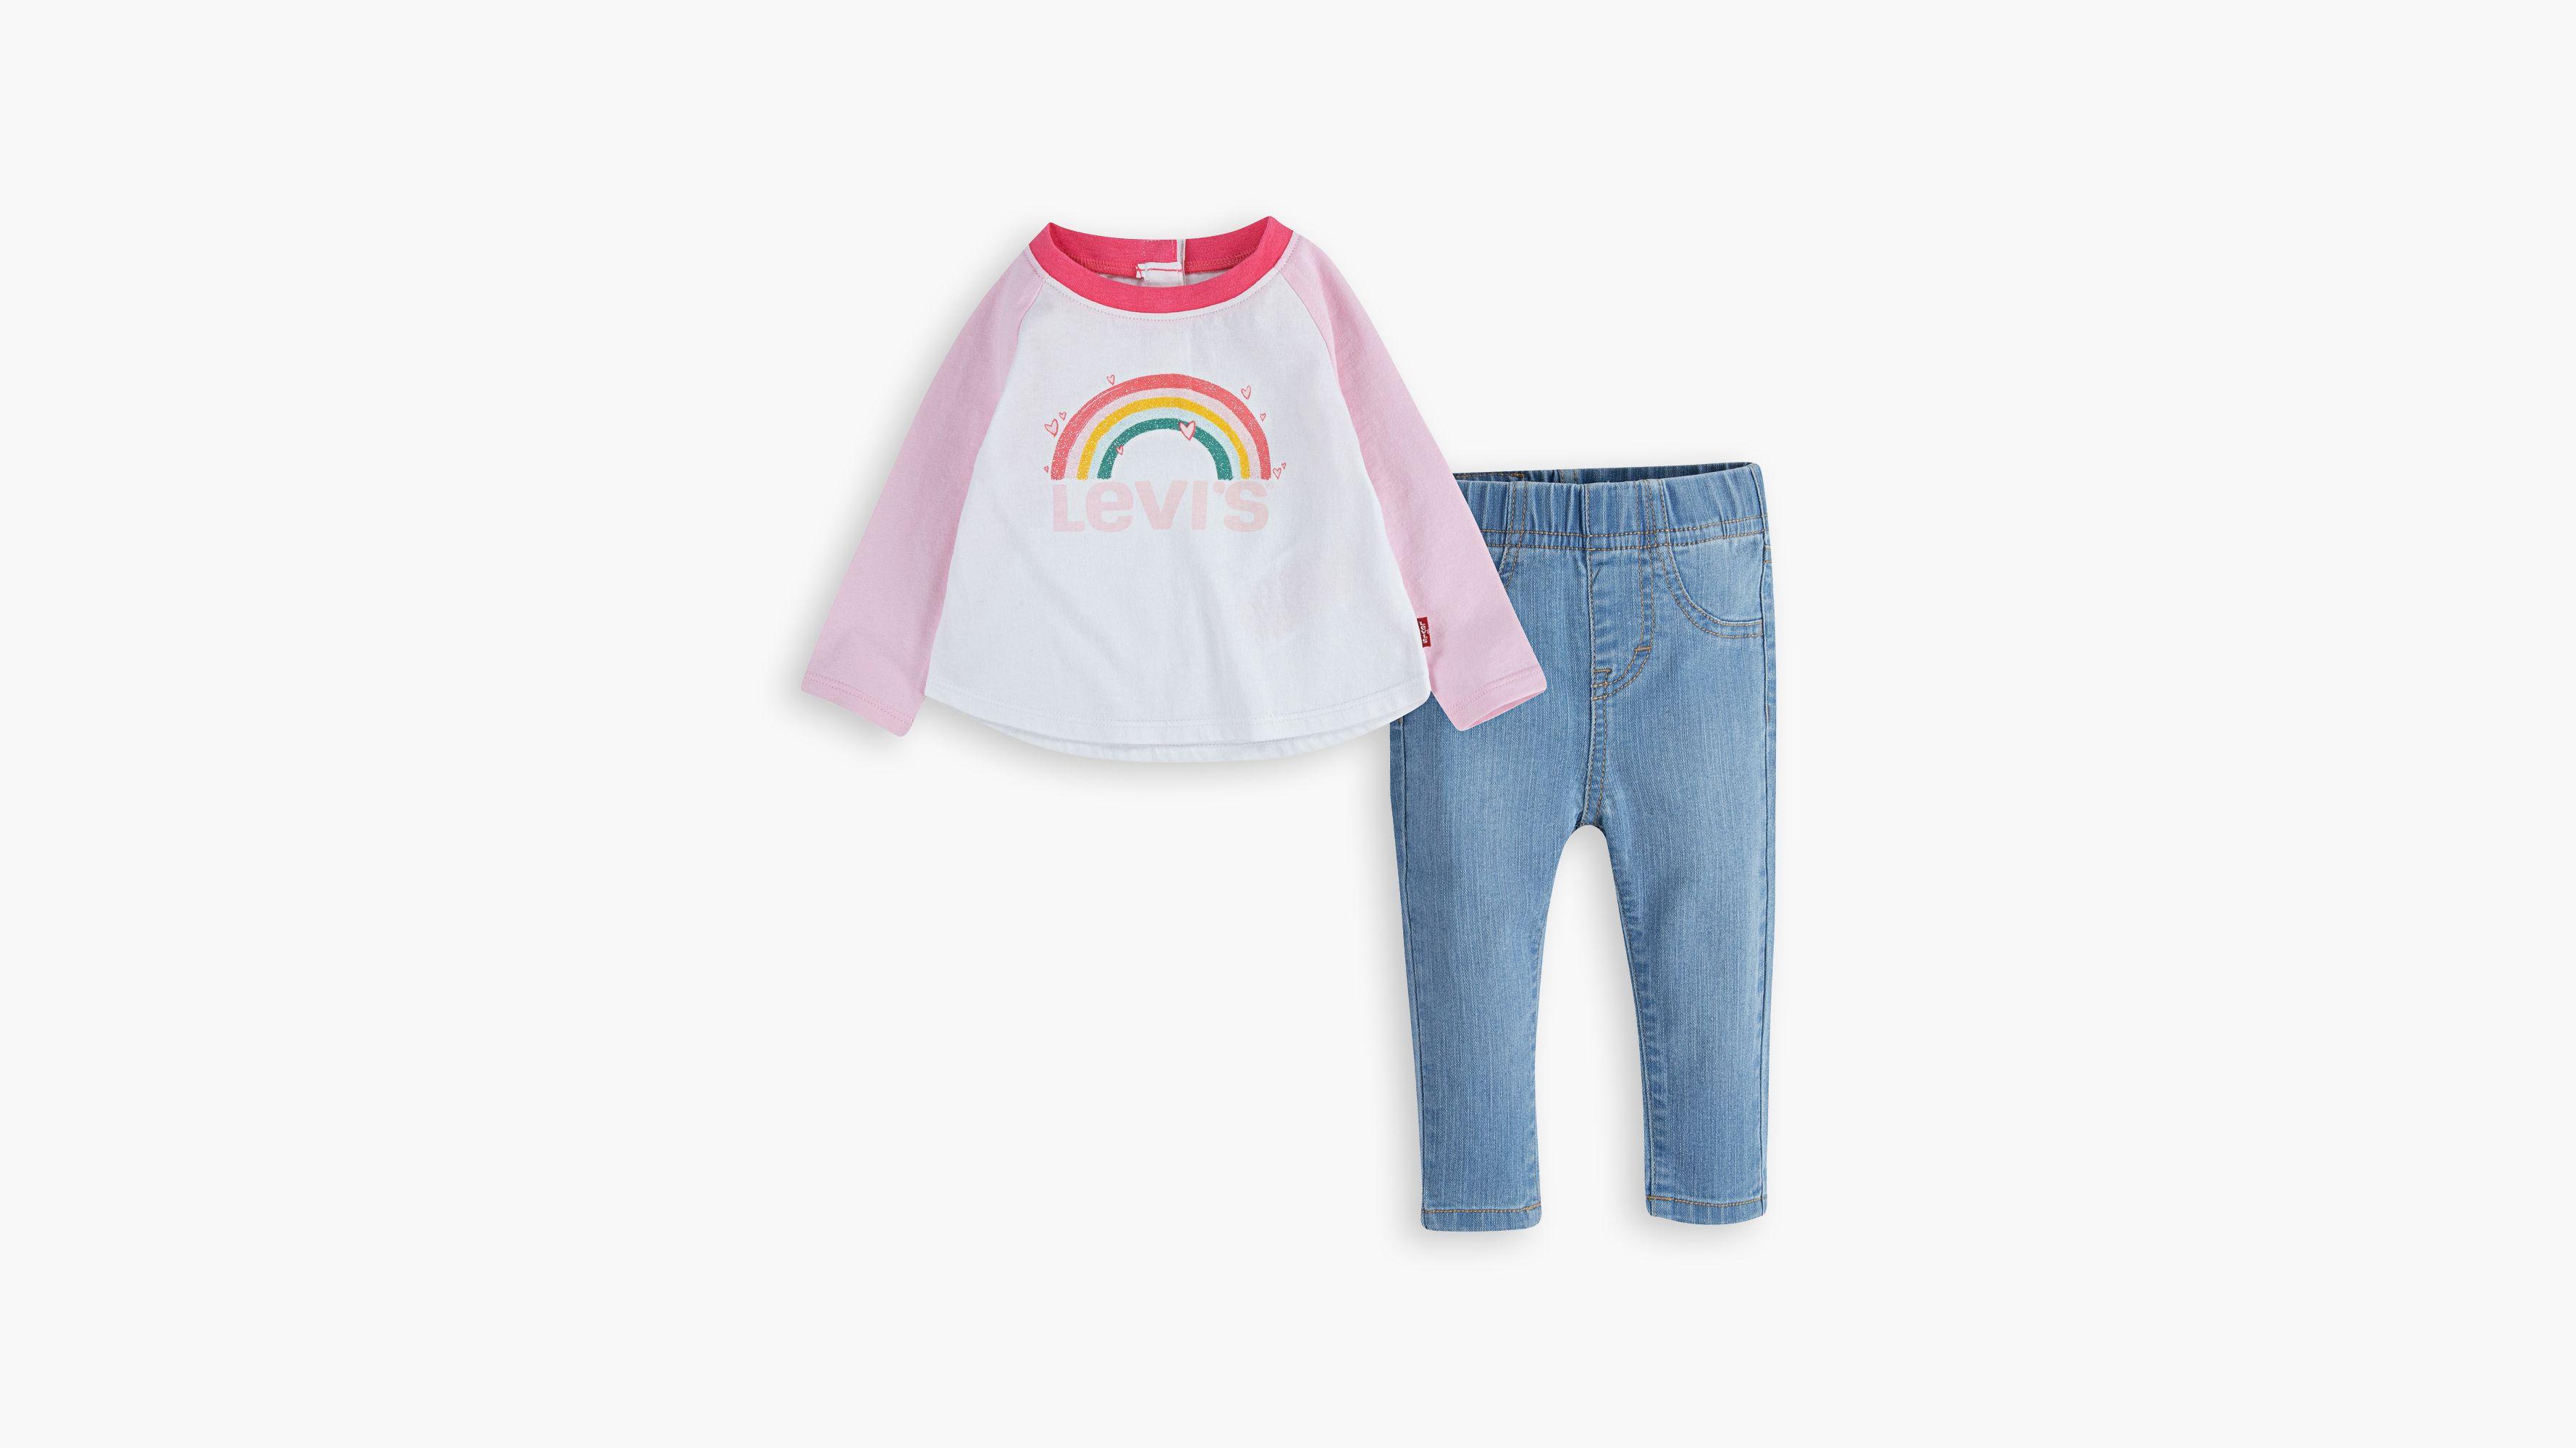 Levis Baby 12m-24m Colorblocked Raglan Set